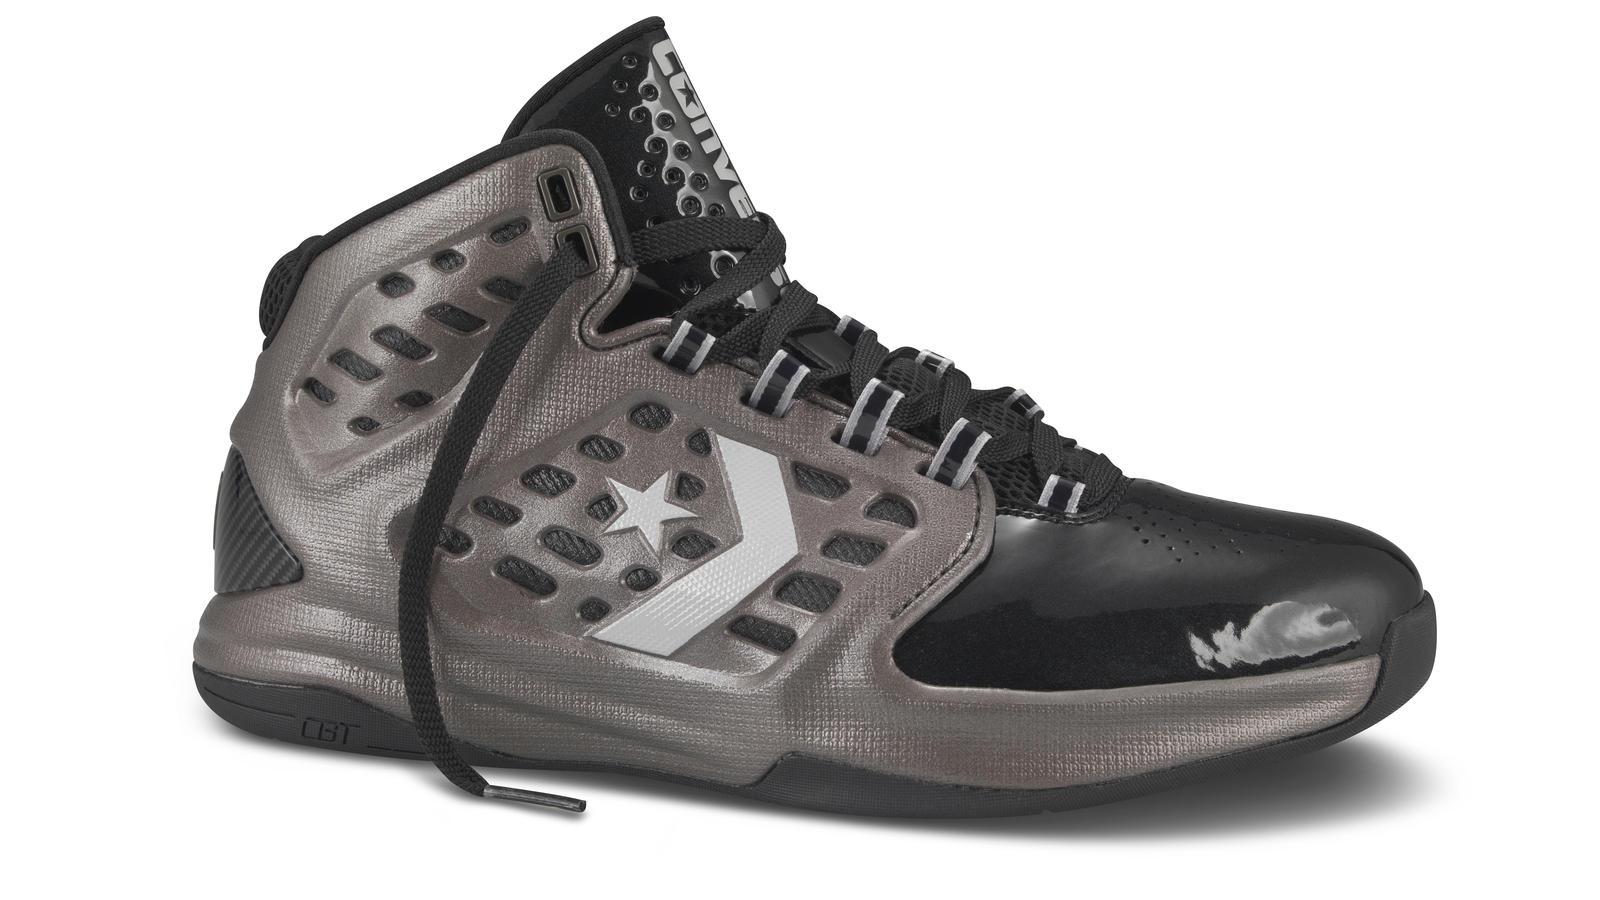 d654538ab0fdaa Converse Holiday 2011 basketball collection showcases advanced ...